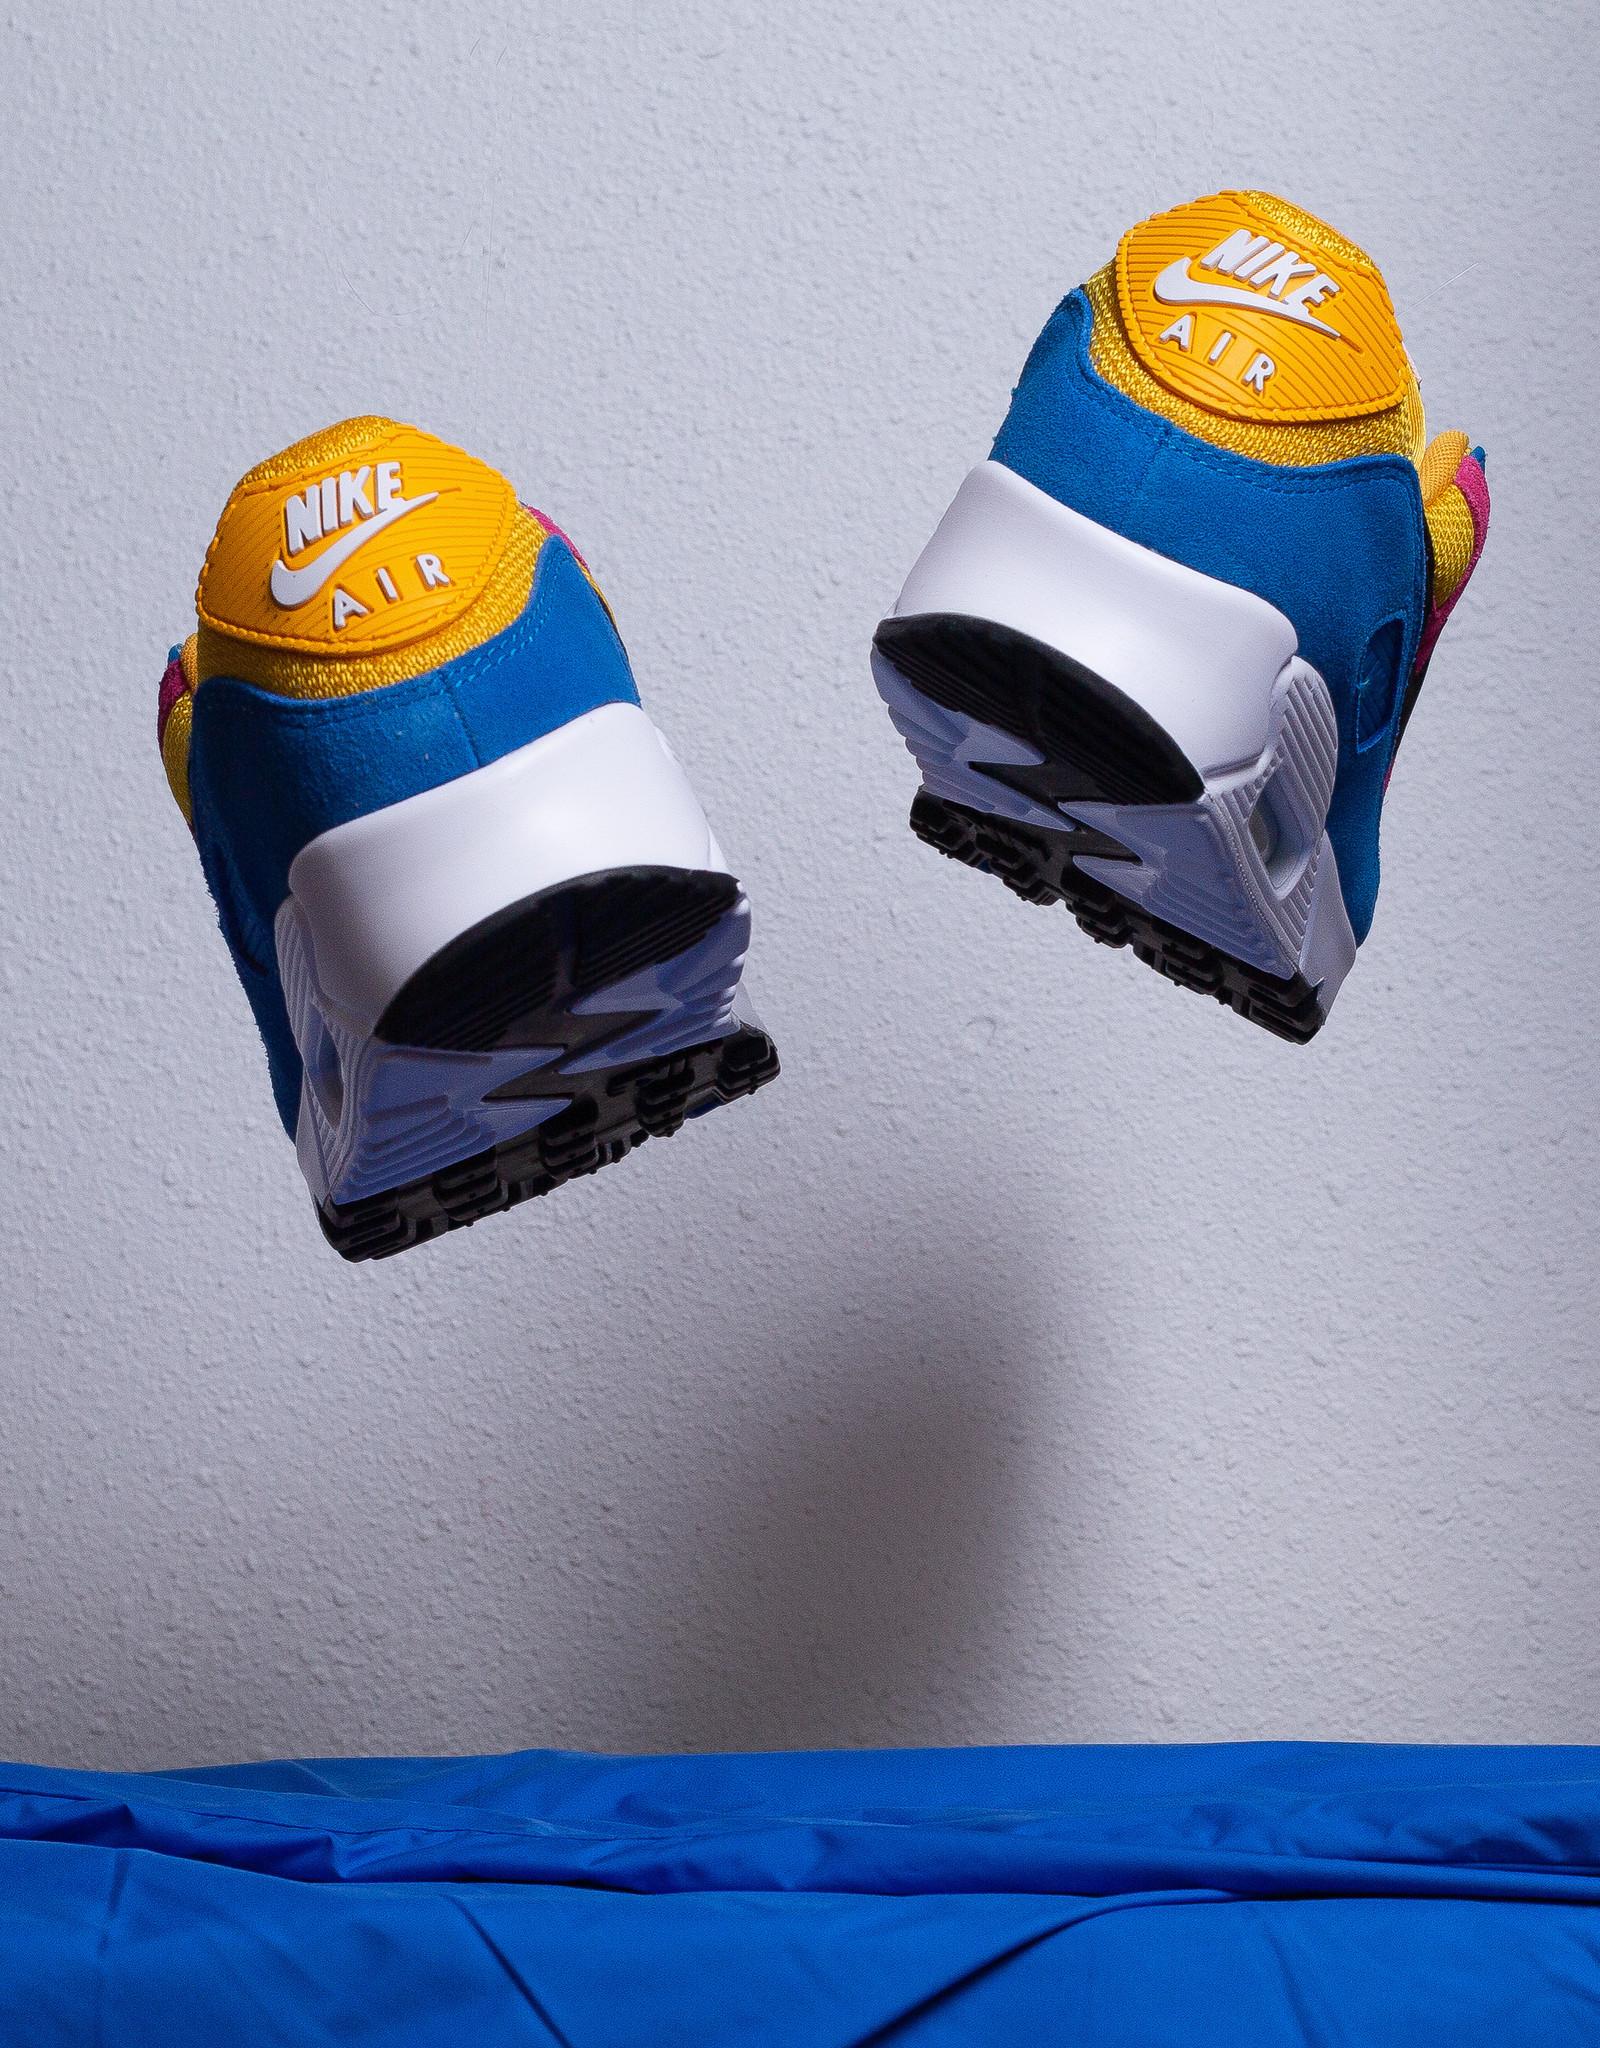 Nike Air Max 90 University Gold/Battle Blue